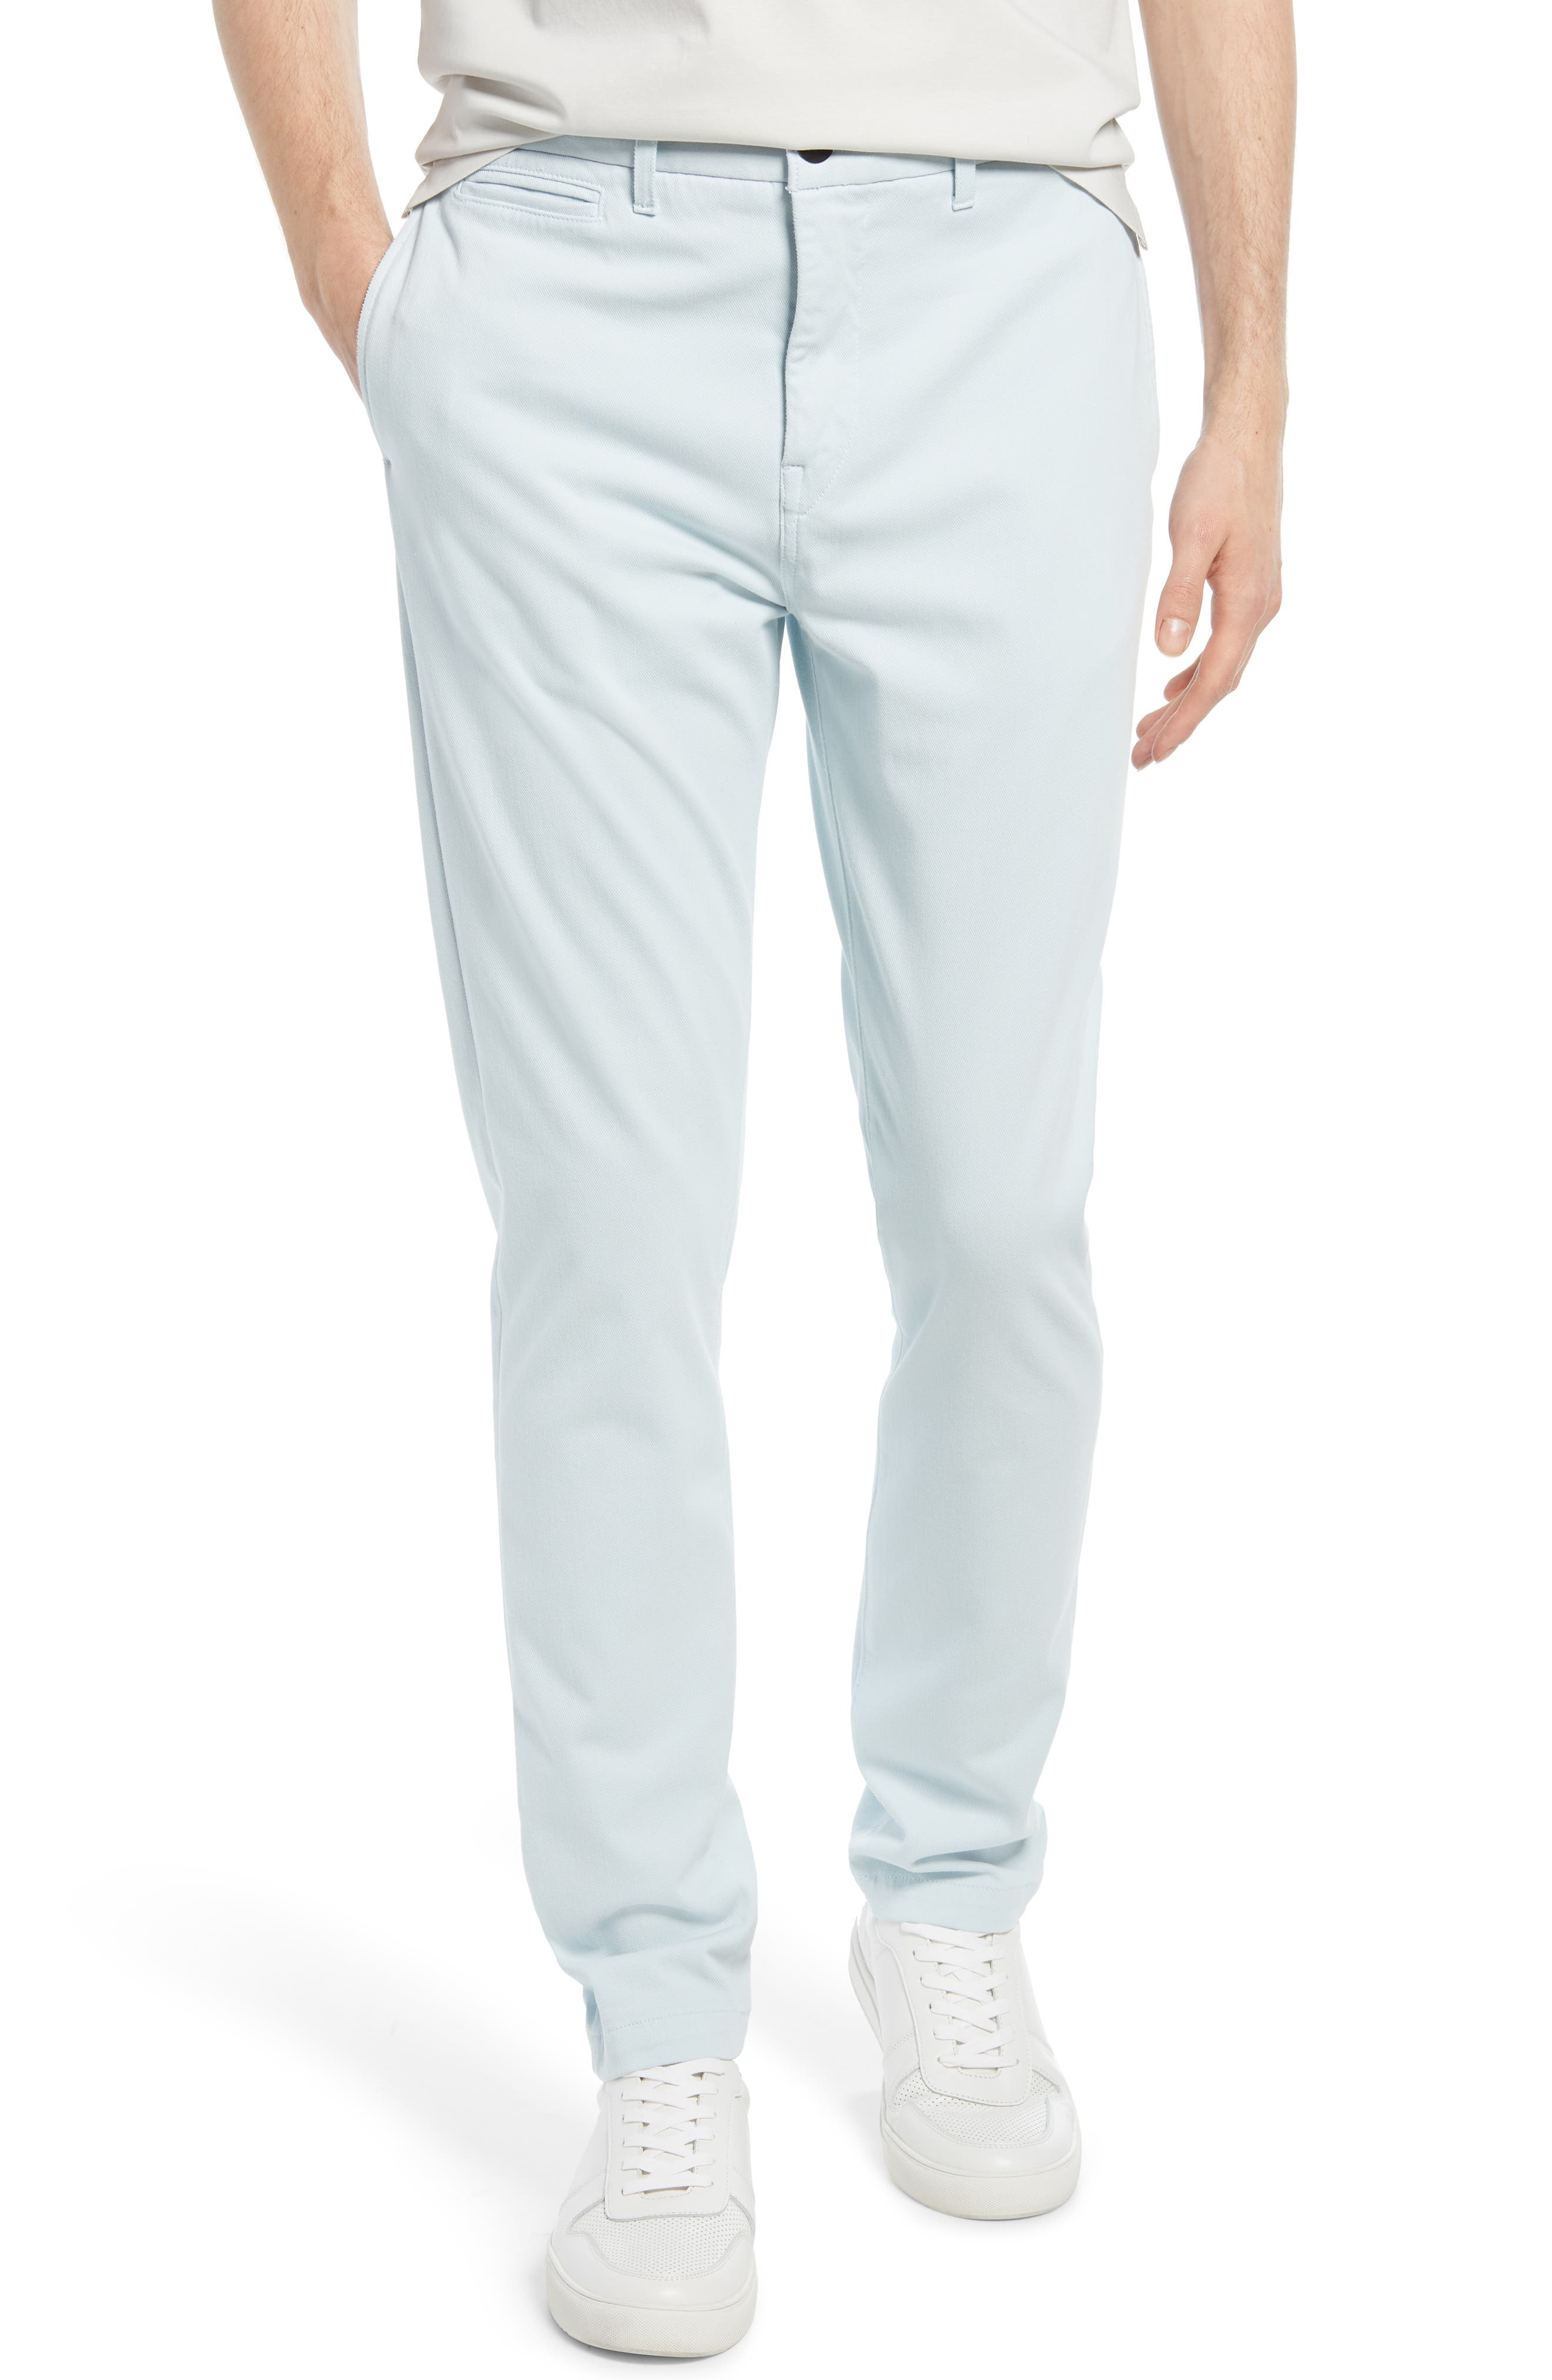 Denit Slim Fit Stretch Chino Pants